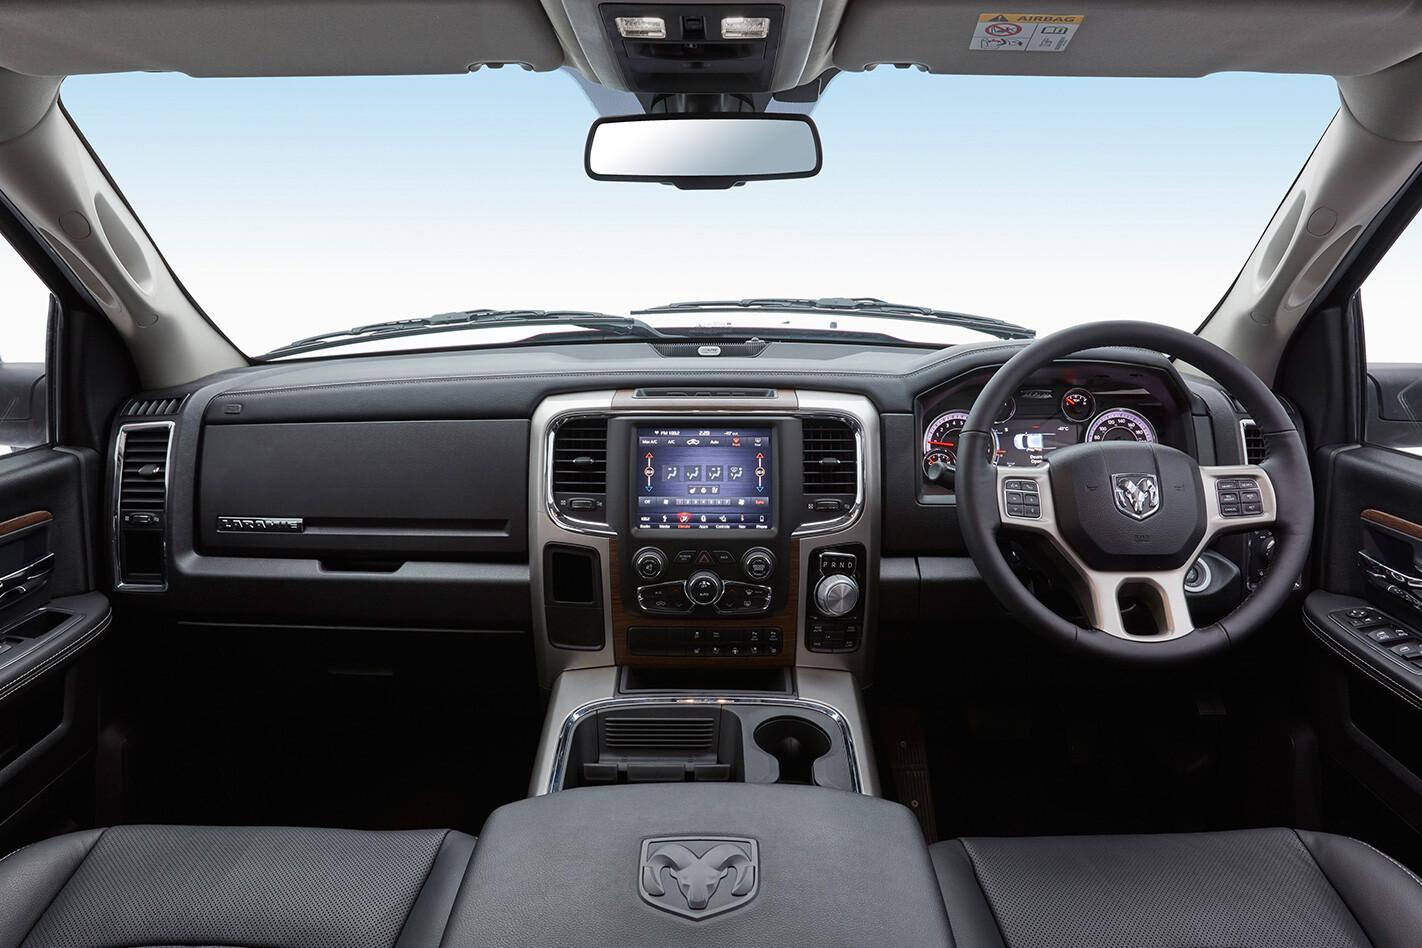 2018 Ram 1500 Laramie interior